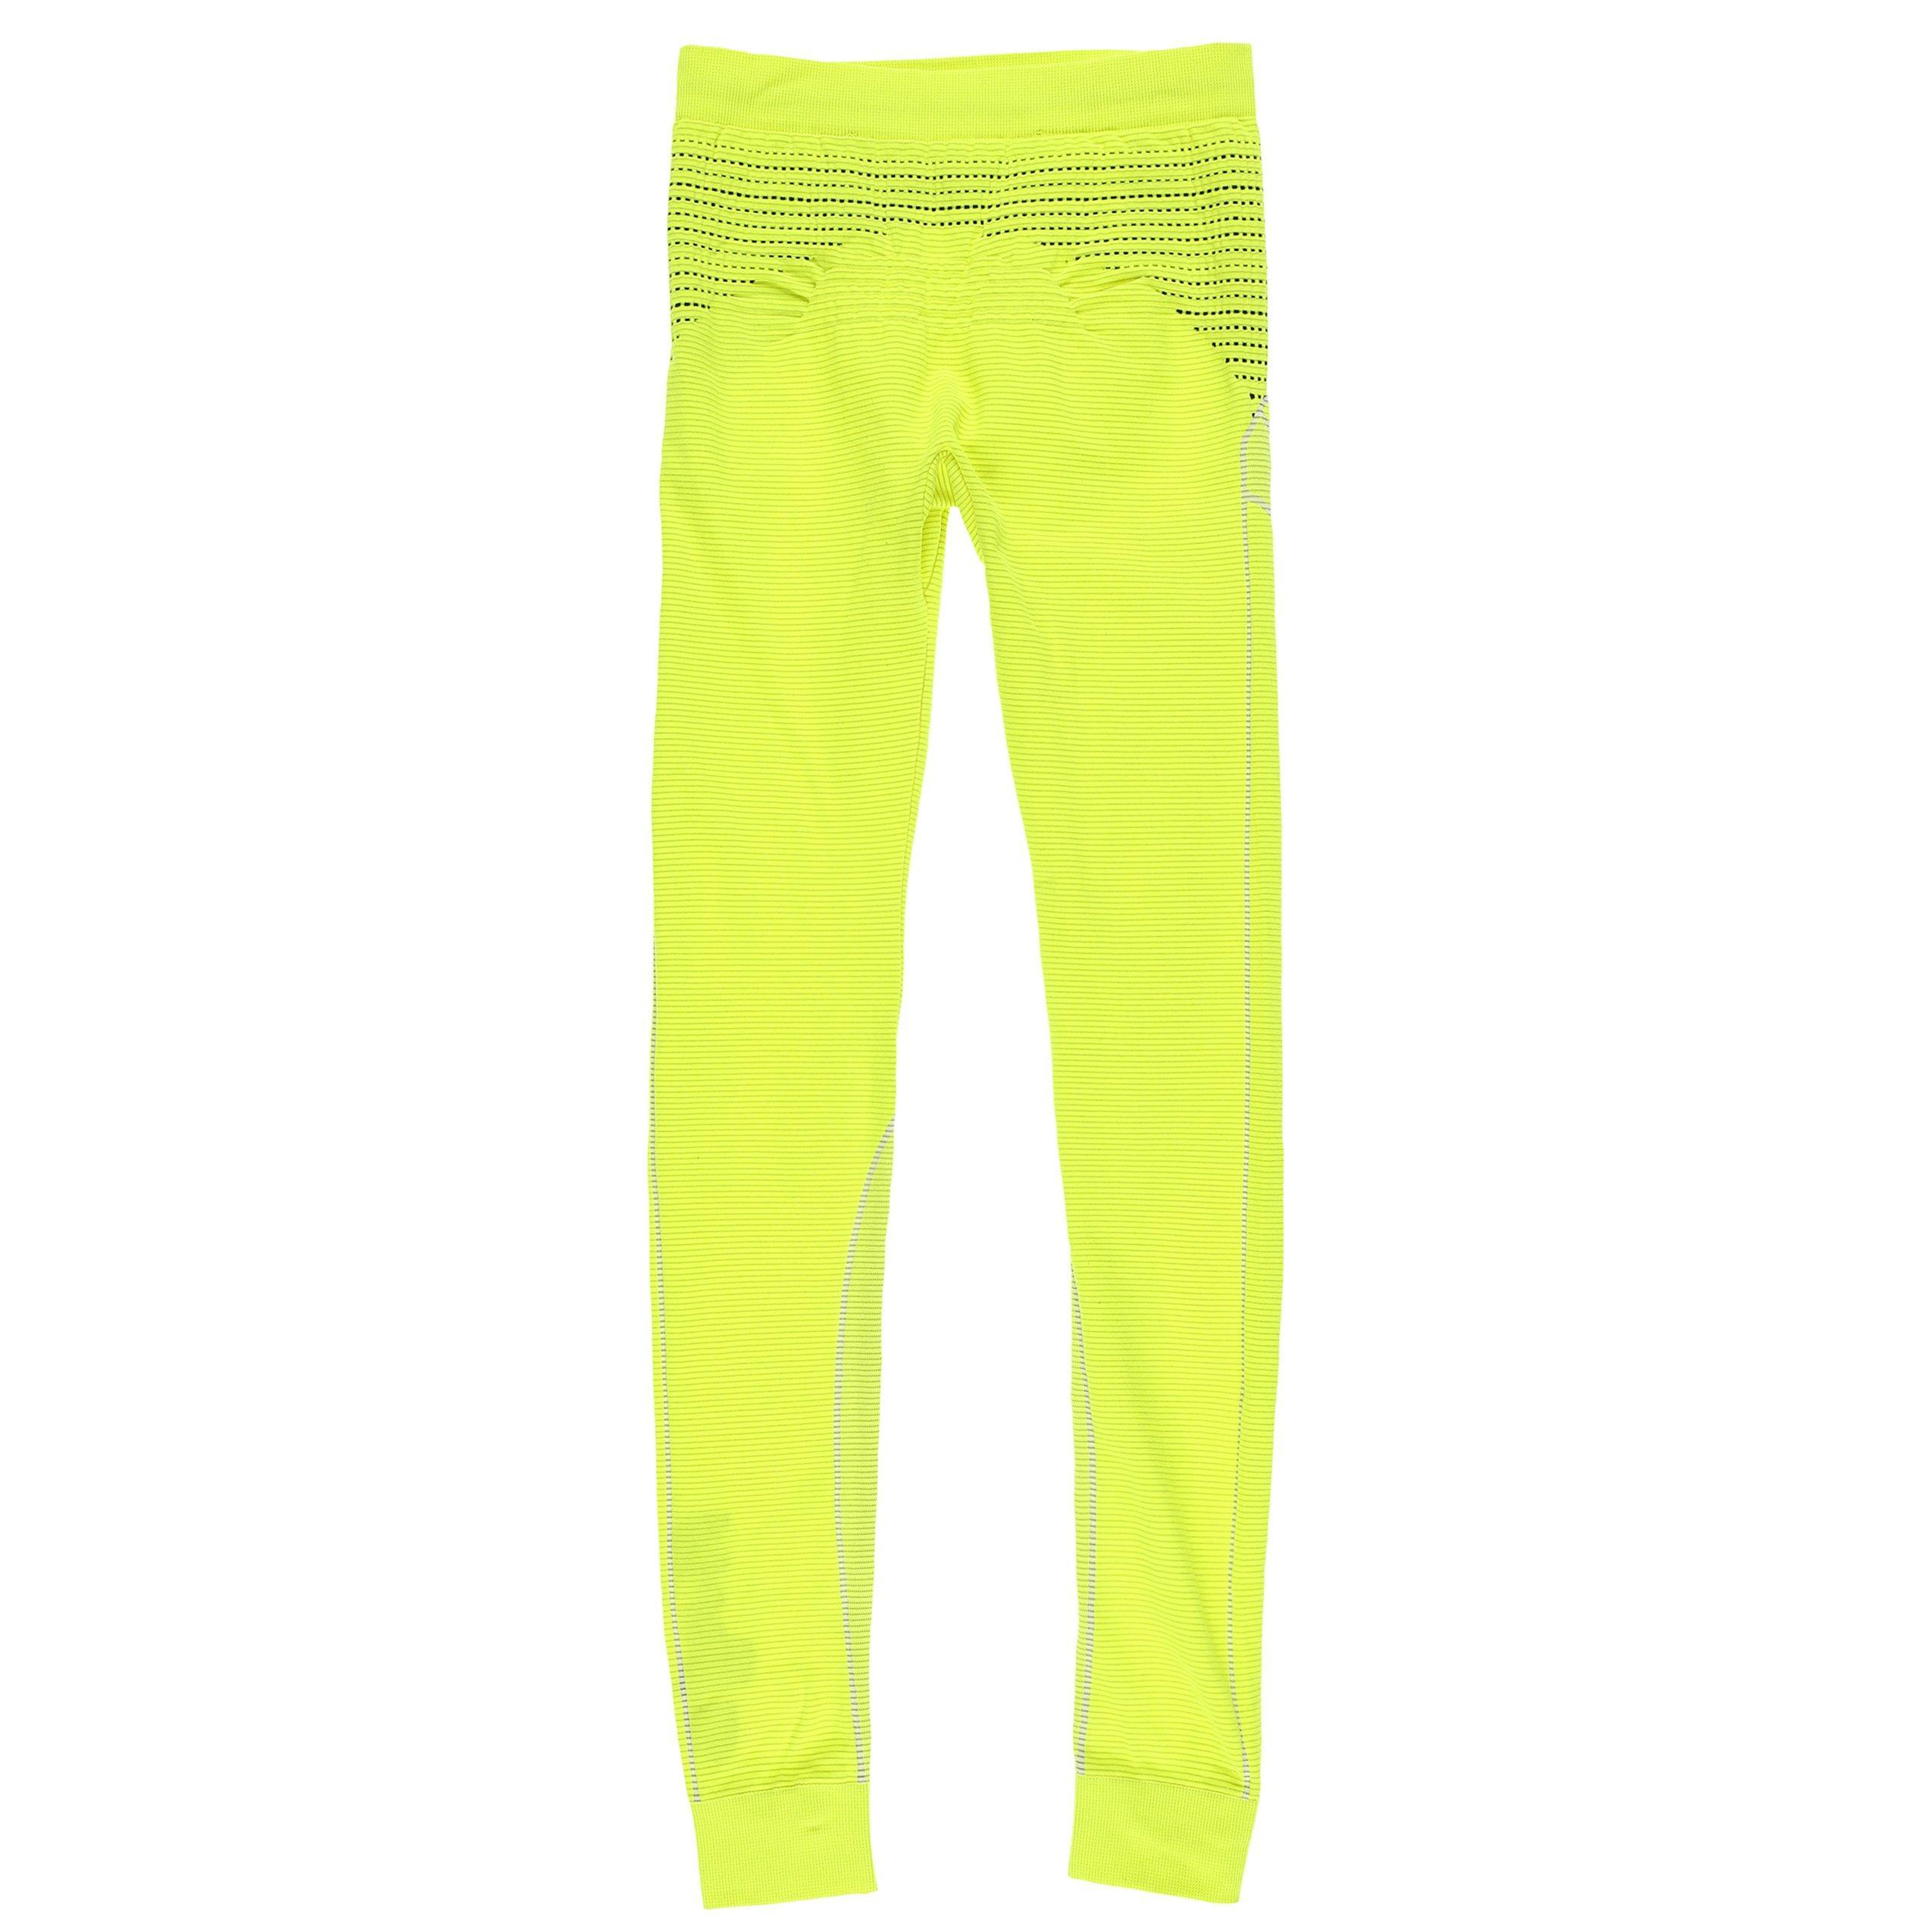 59d90ca9 Off-White c/o Virgil Abloh - Yellow Women's Athletic Leggings - Lyst. View  fullscreen